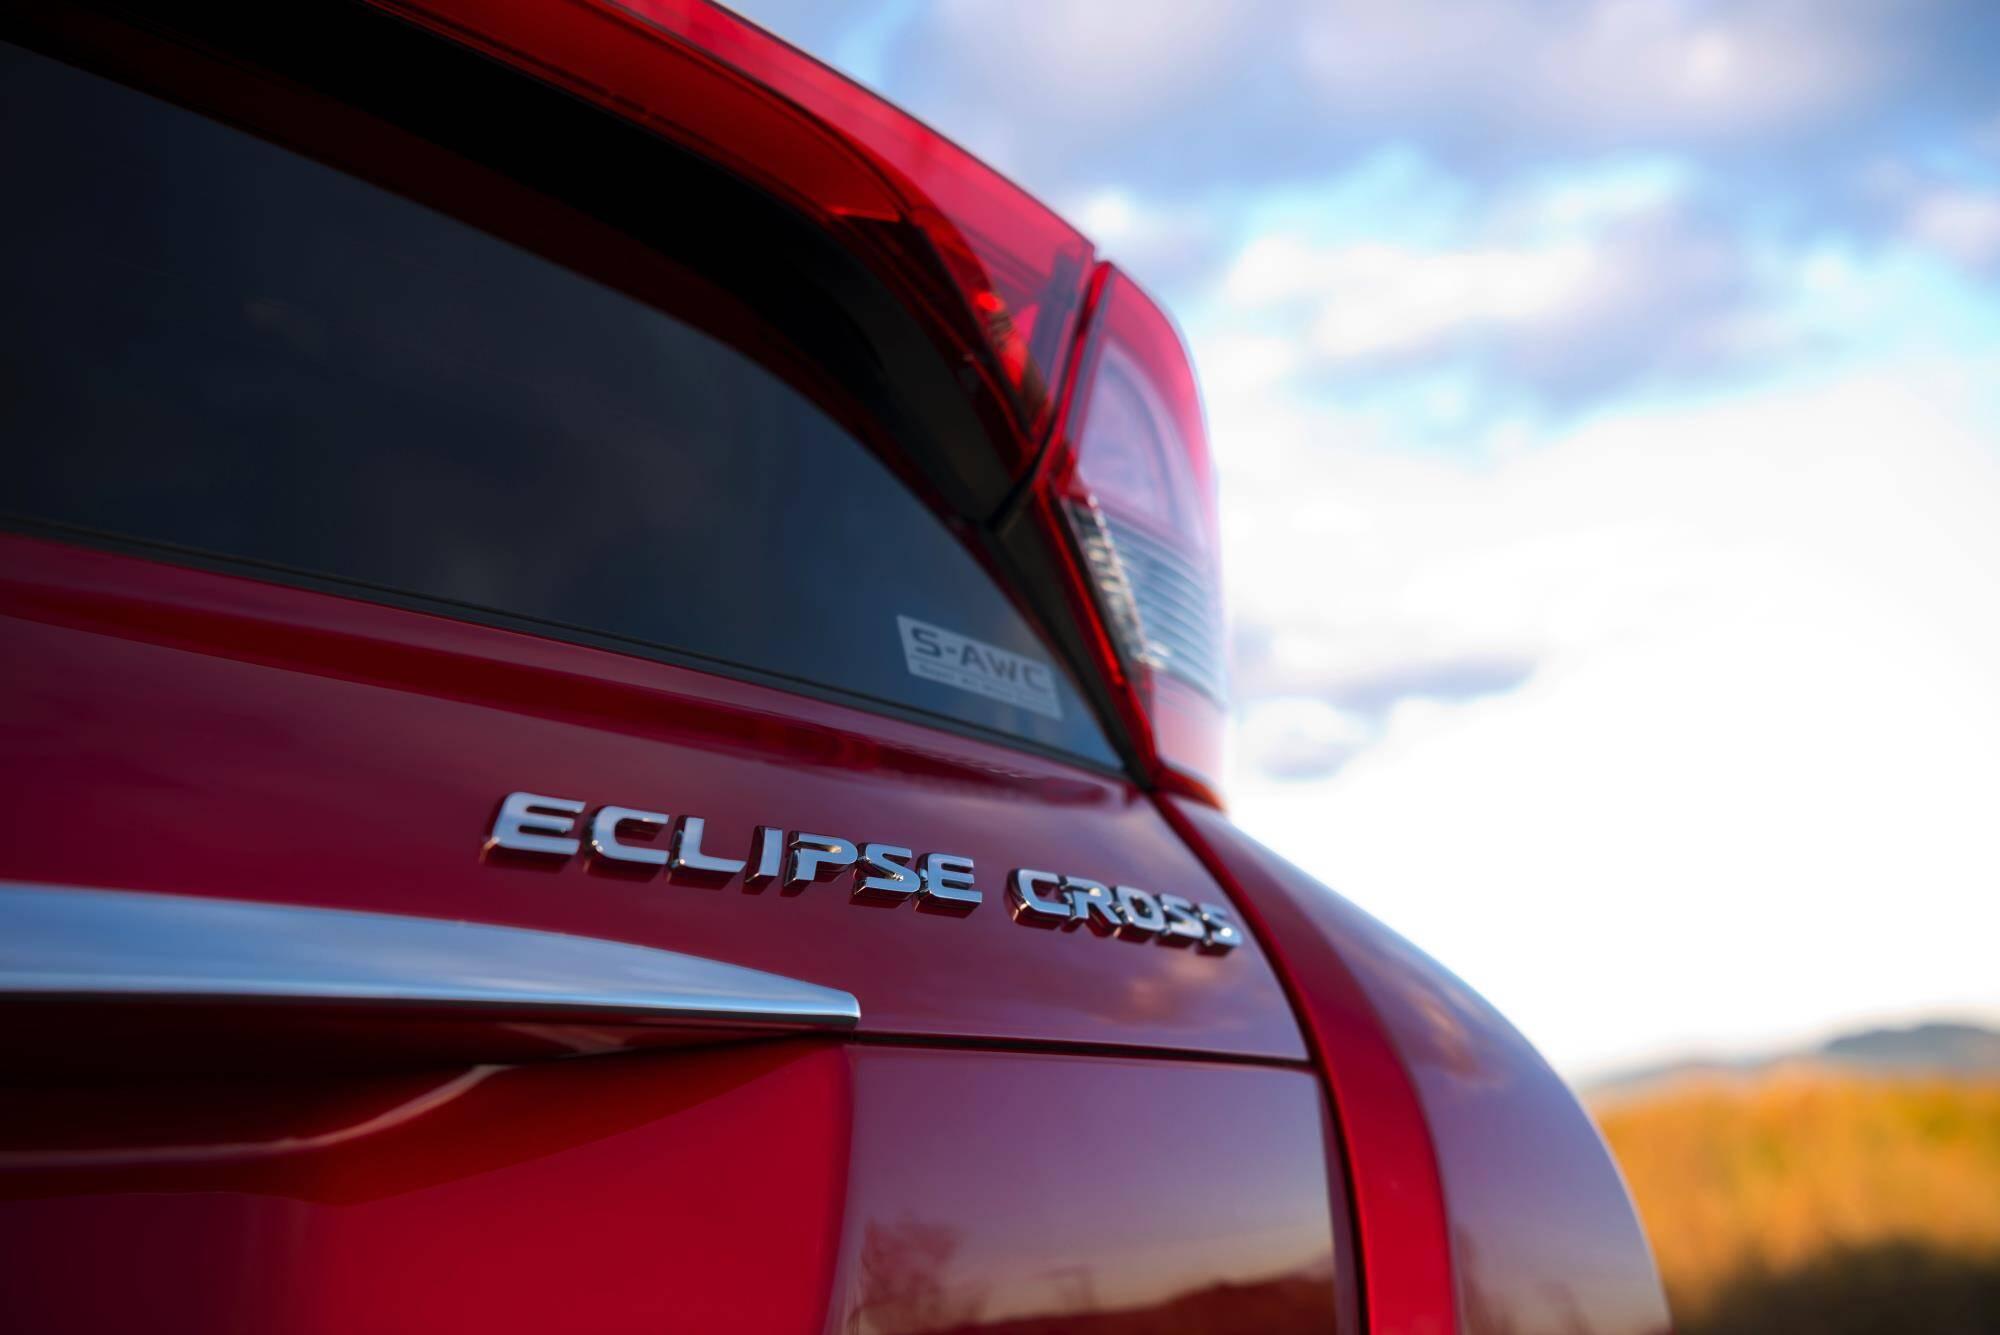 Mitsubishi Eclipse Cross. Foto: Divulgação